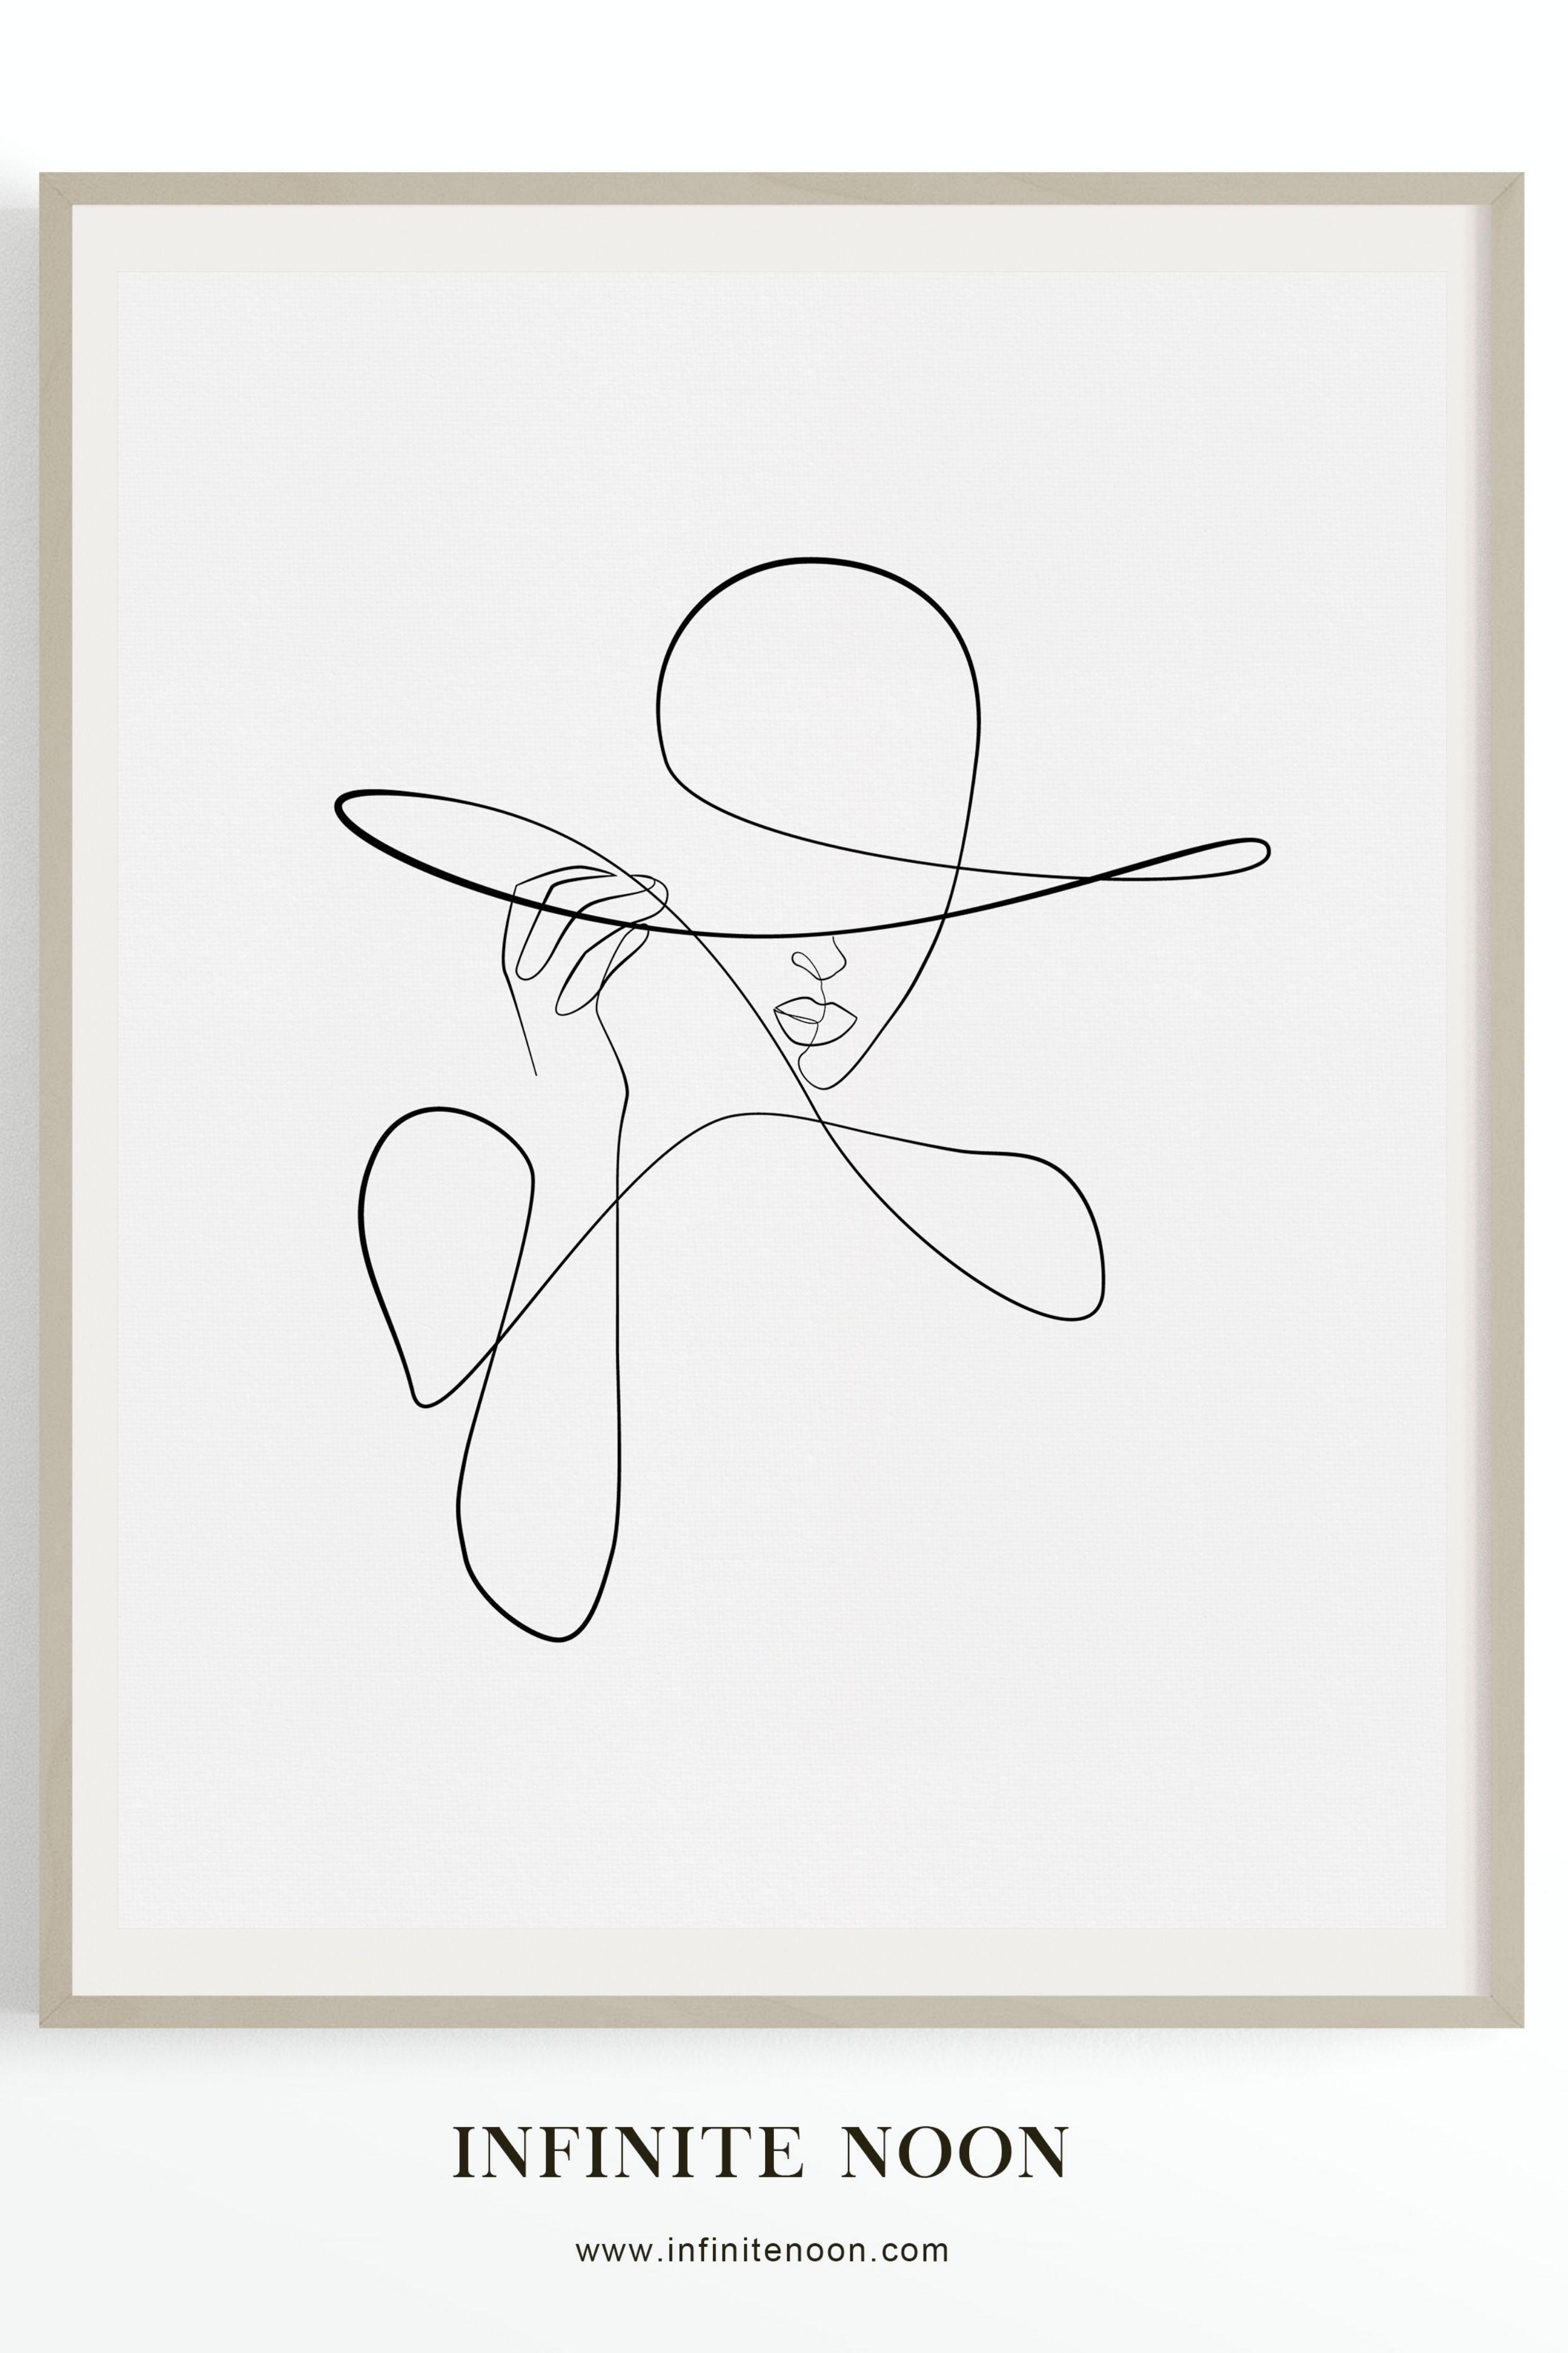 Hat Fashionista Minimal Fashion Wall Art, Fashionista Hat Line Drawing, Fashion …